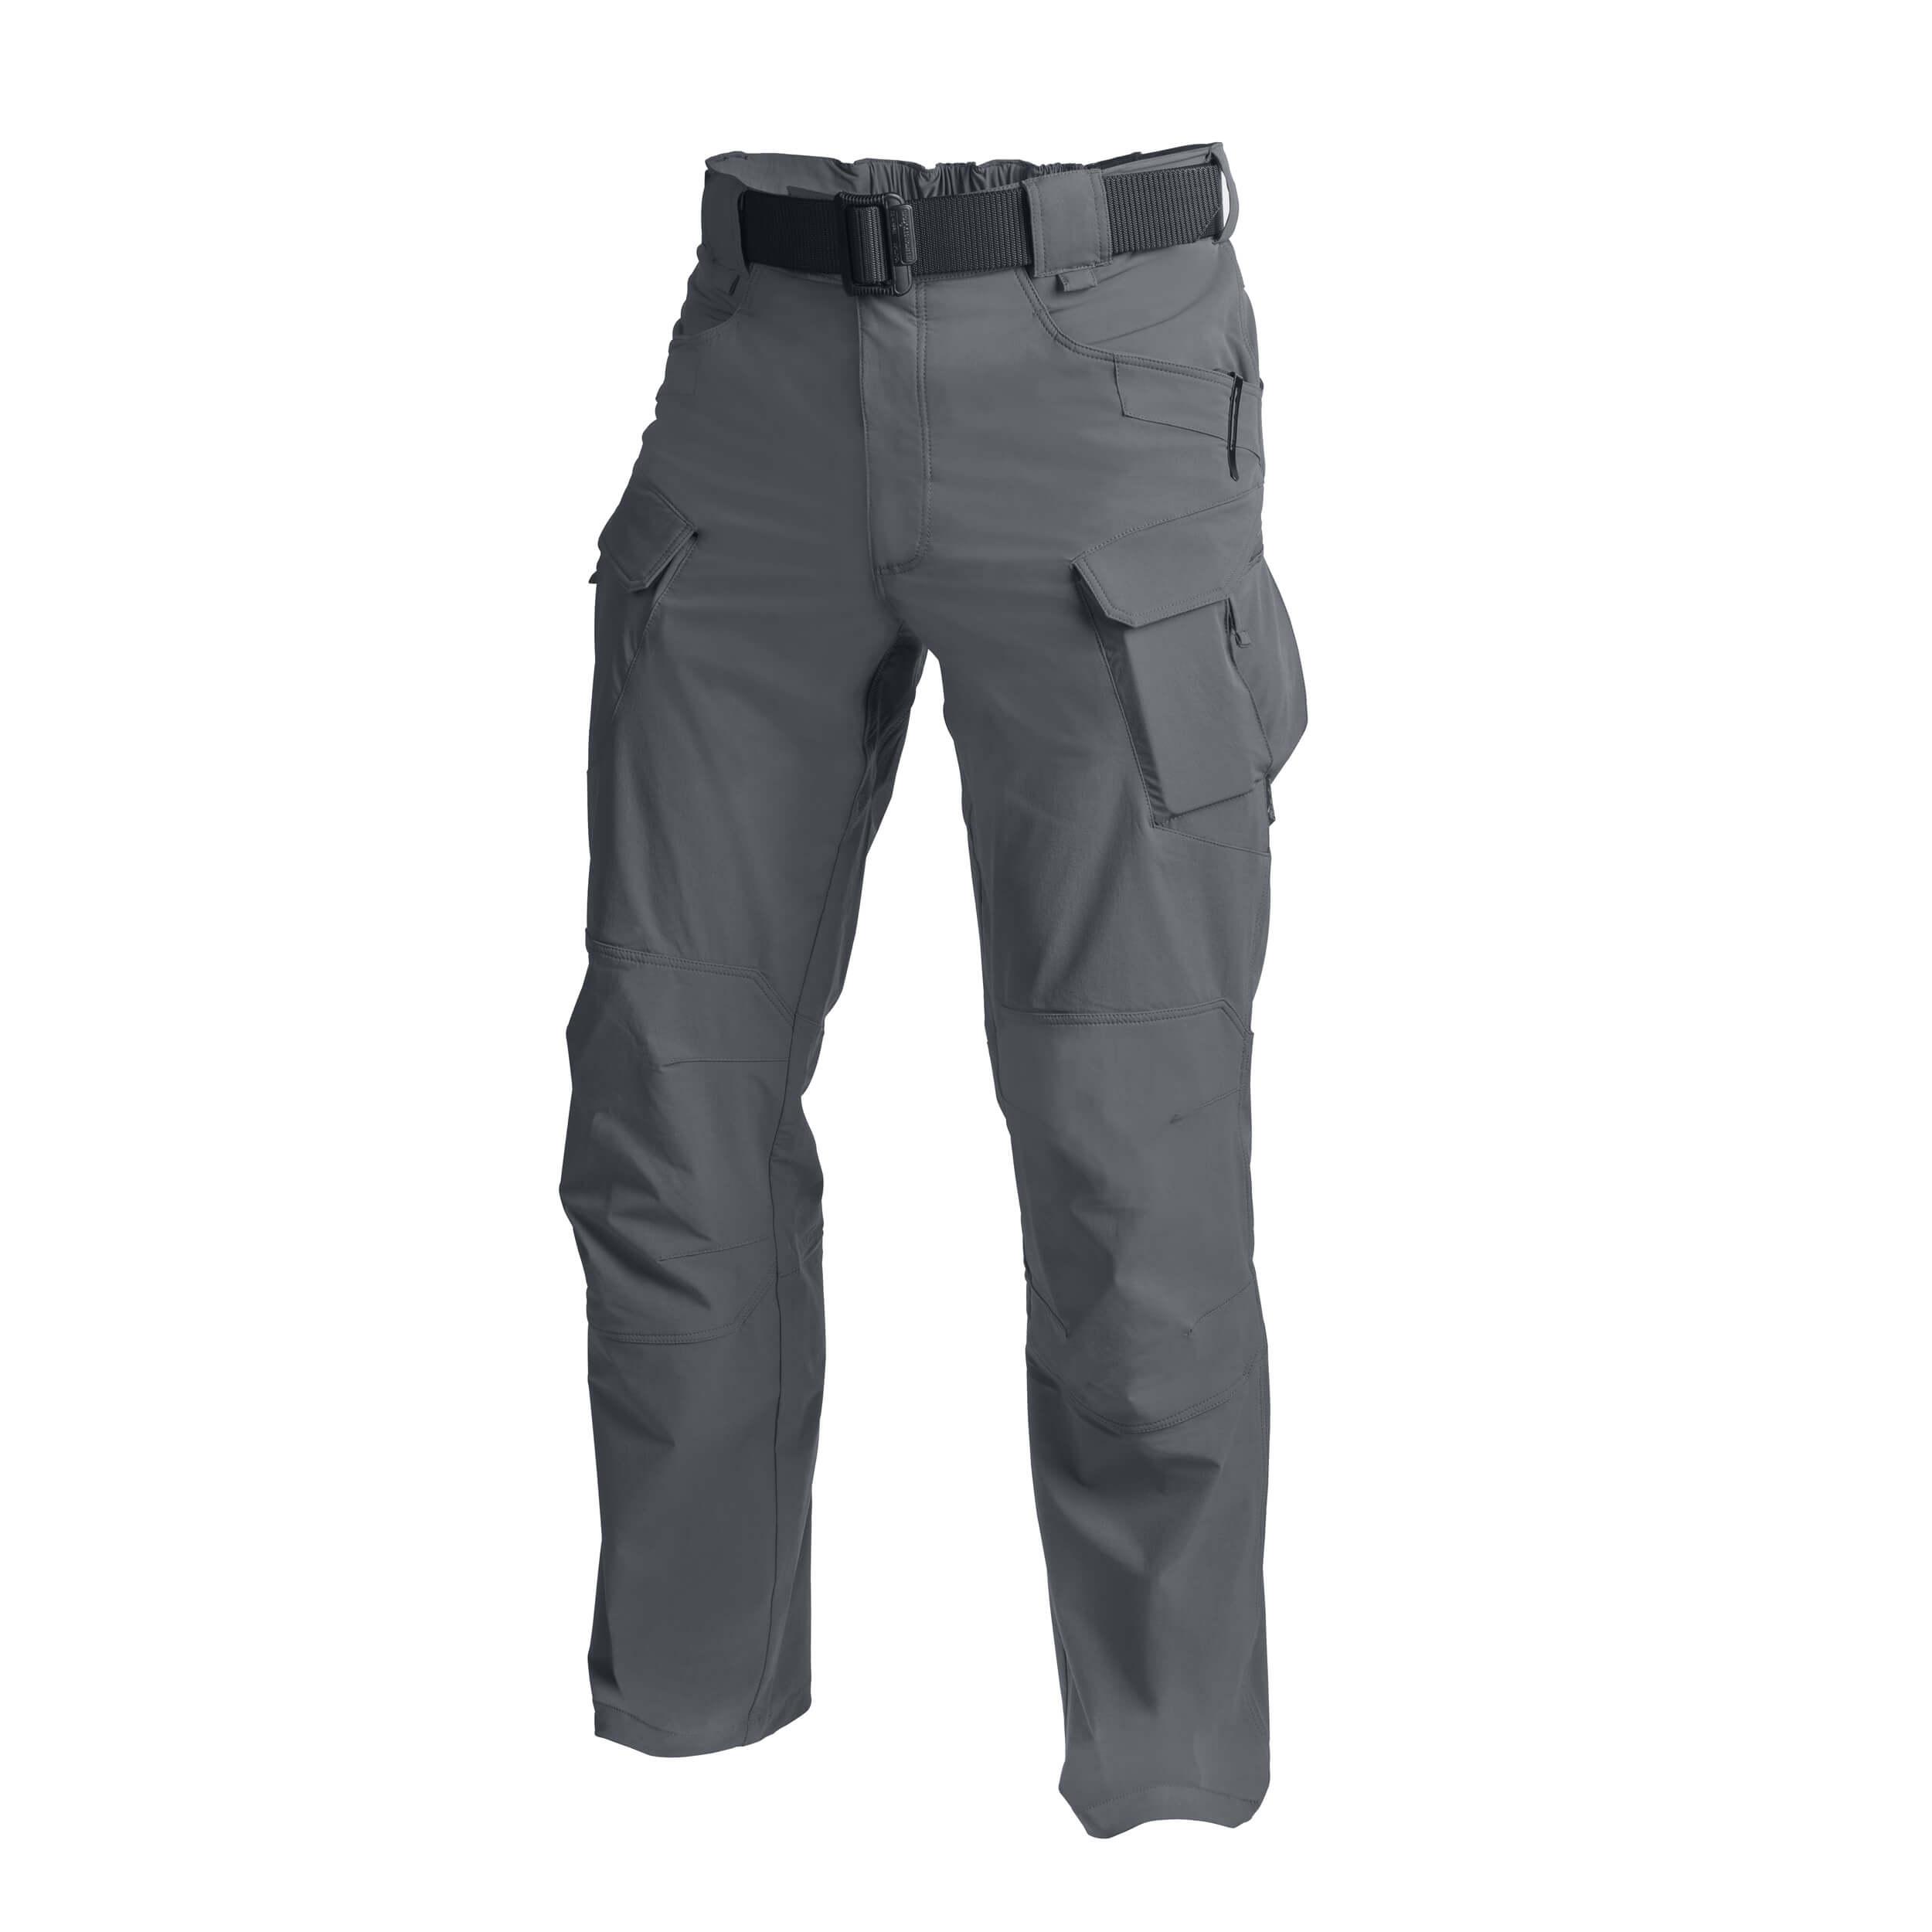 Helikon-Tex OTP Hose (Outdoor Tactical Pants) - VersaStretch - Shadow Grey